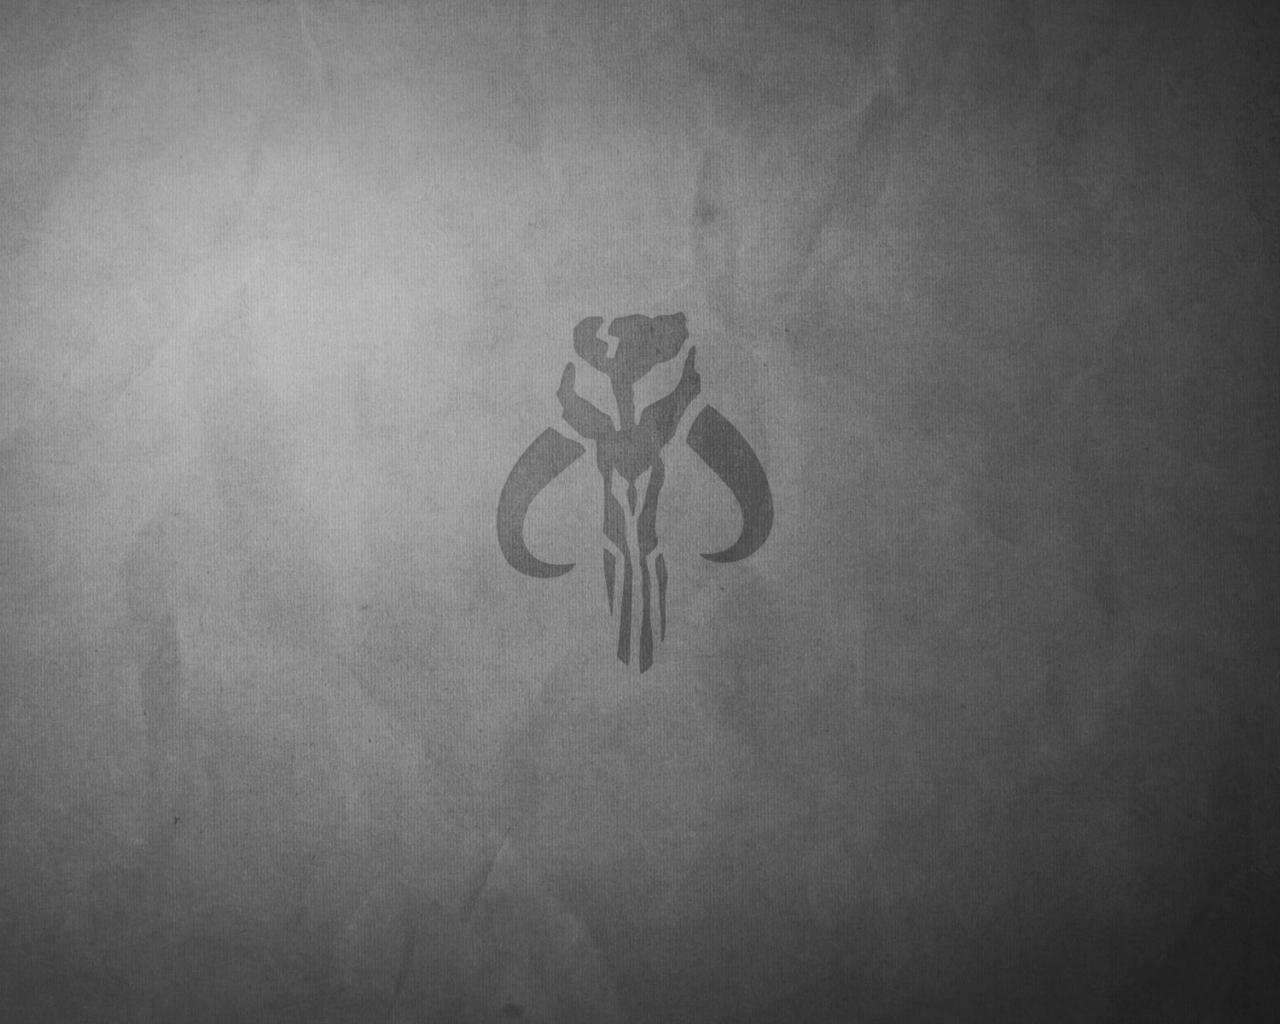 Free Download Images For Star Wars Mandalorian Wallpaper 1920x1200 For Your Desktop Mobile Tablet Explore 48 Star Wars Mandalorian Wallpaper Mandalorian Iphone Wallpaper Mandalorian Hd Wallpaper